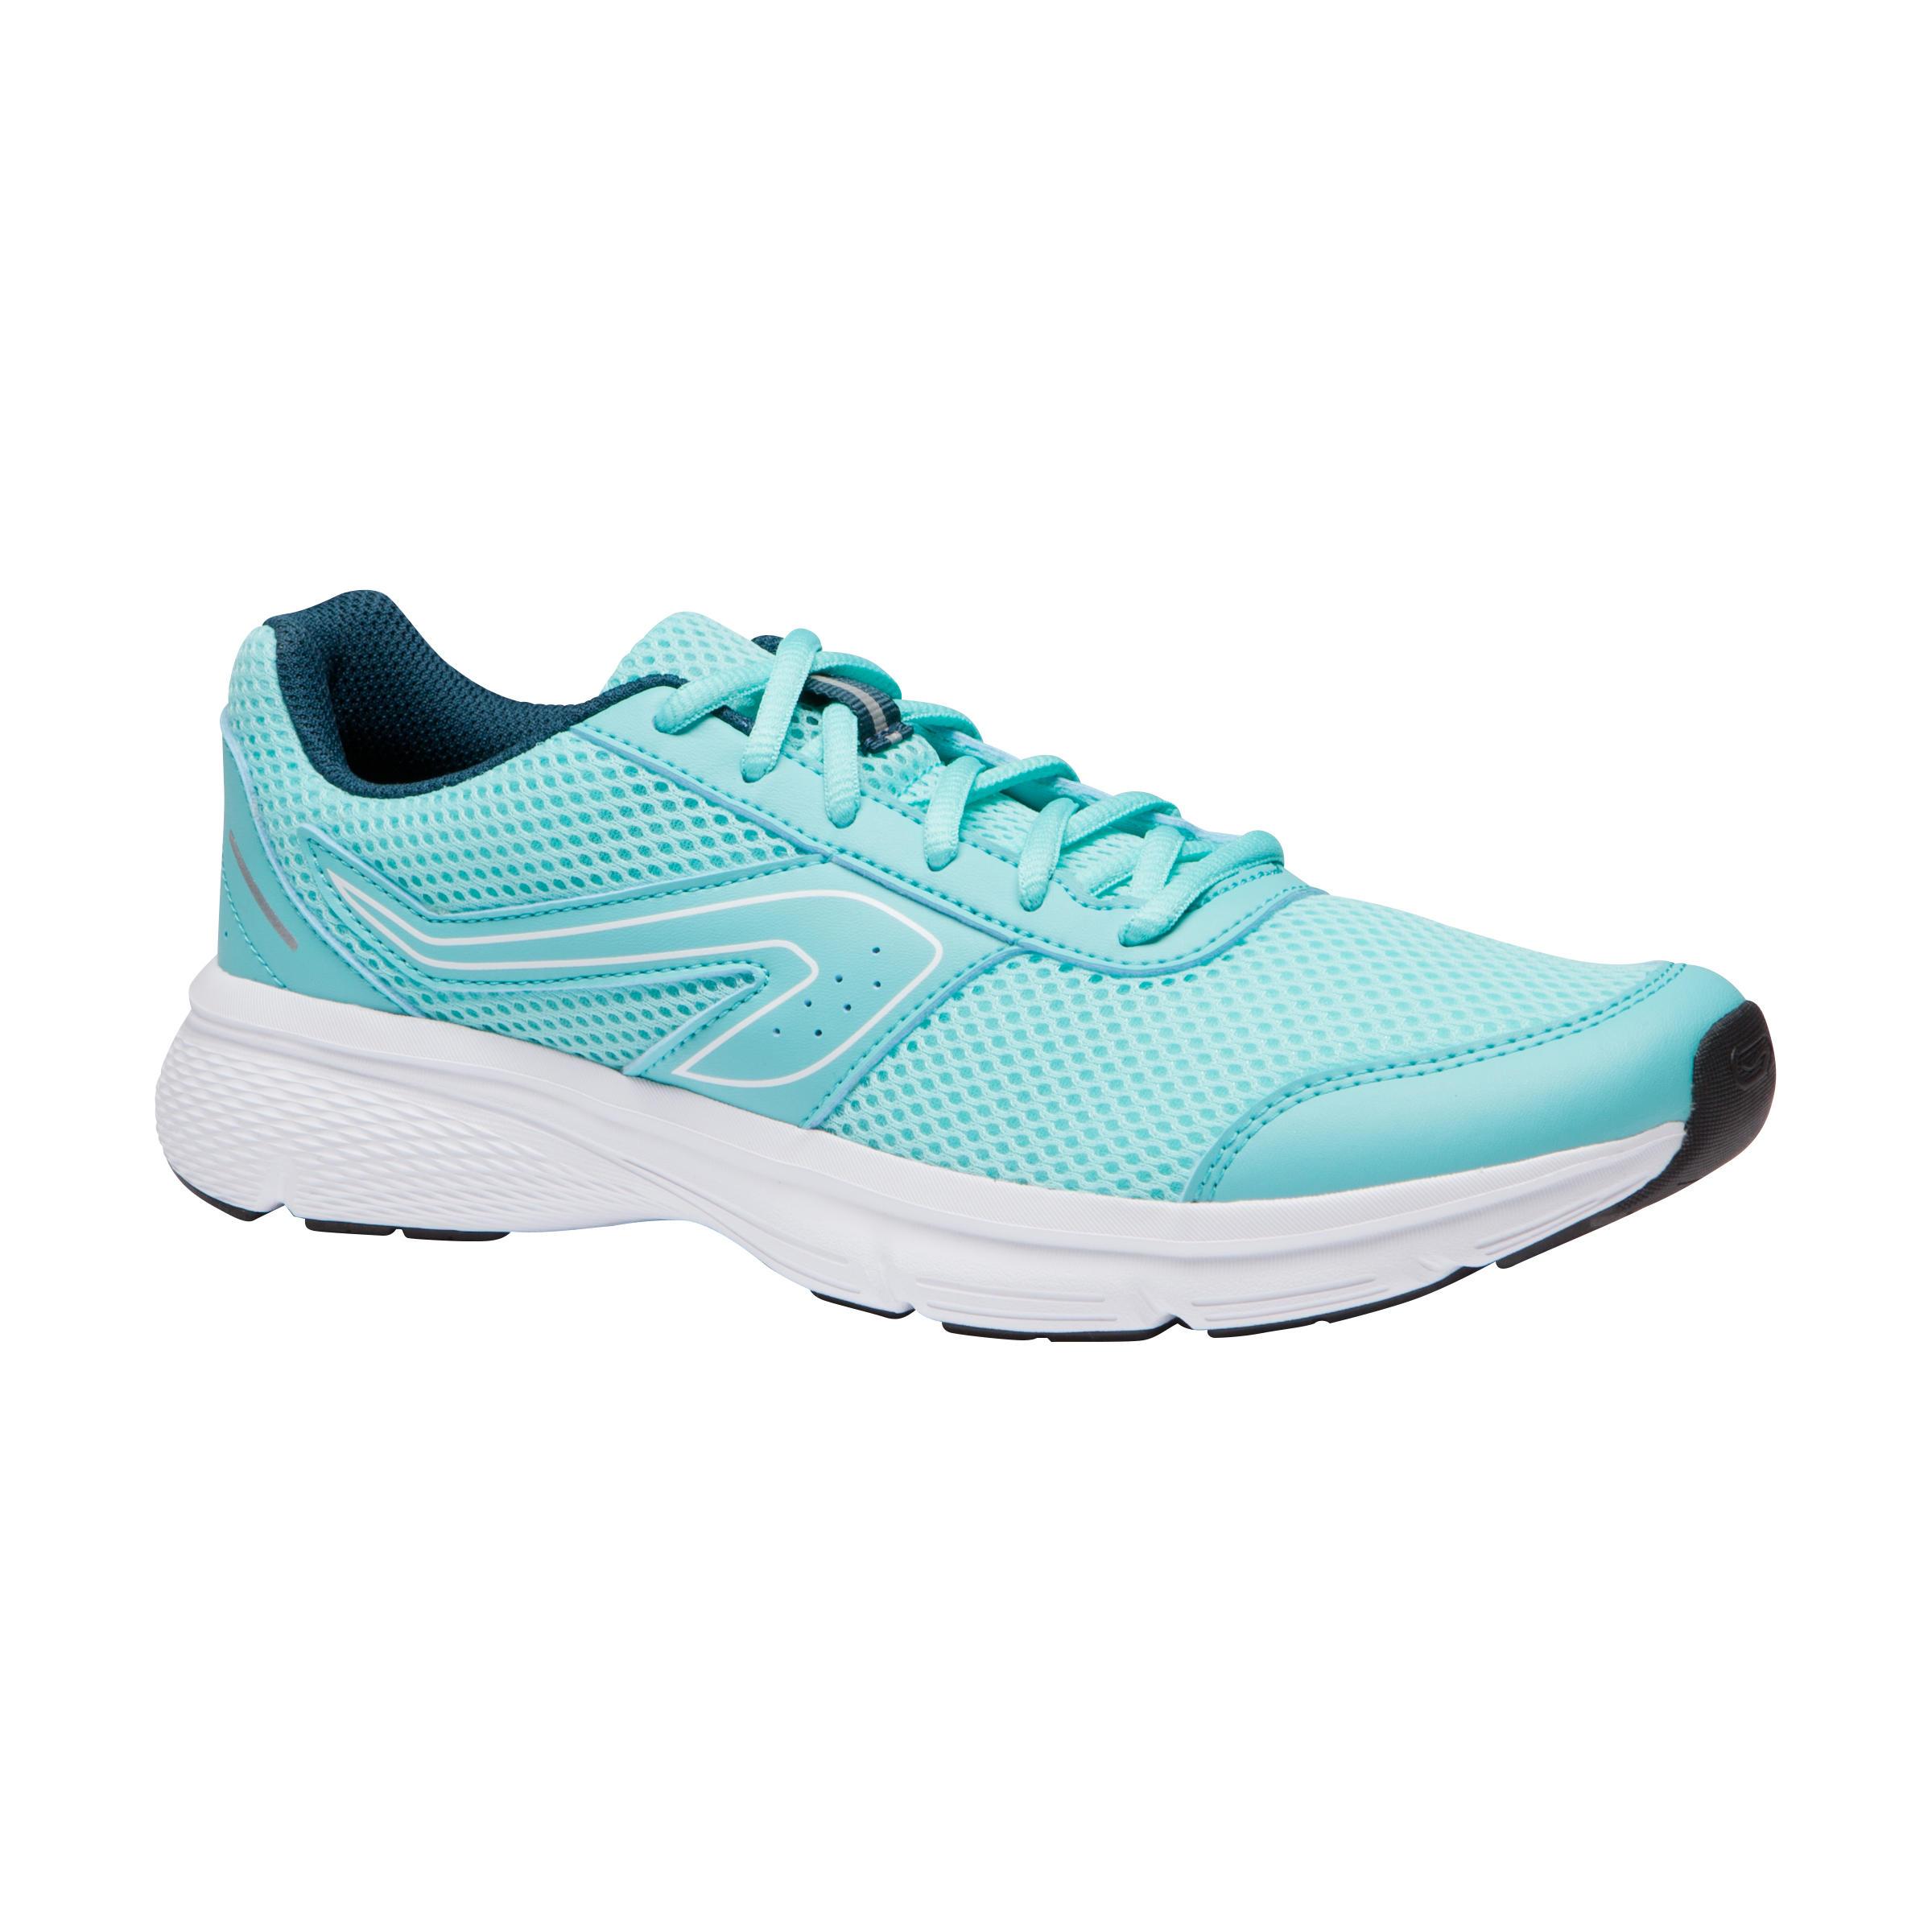 Kalenji Joggingschoenen voor dames Run Cushion lichtgroen